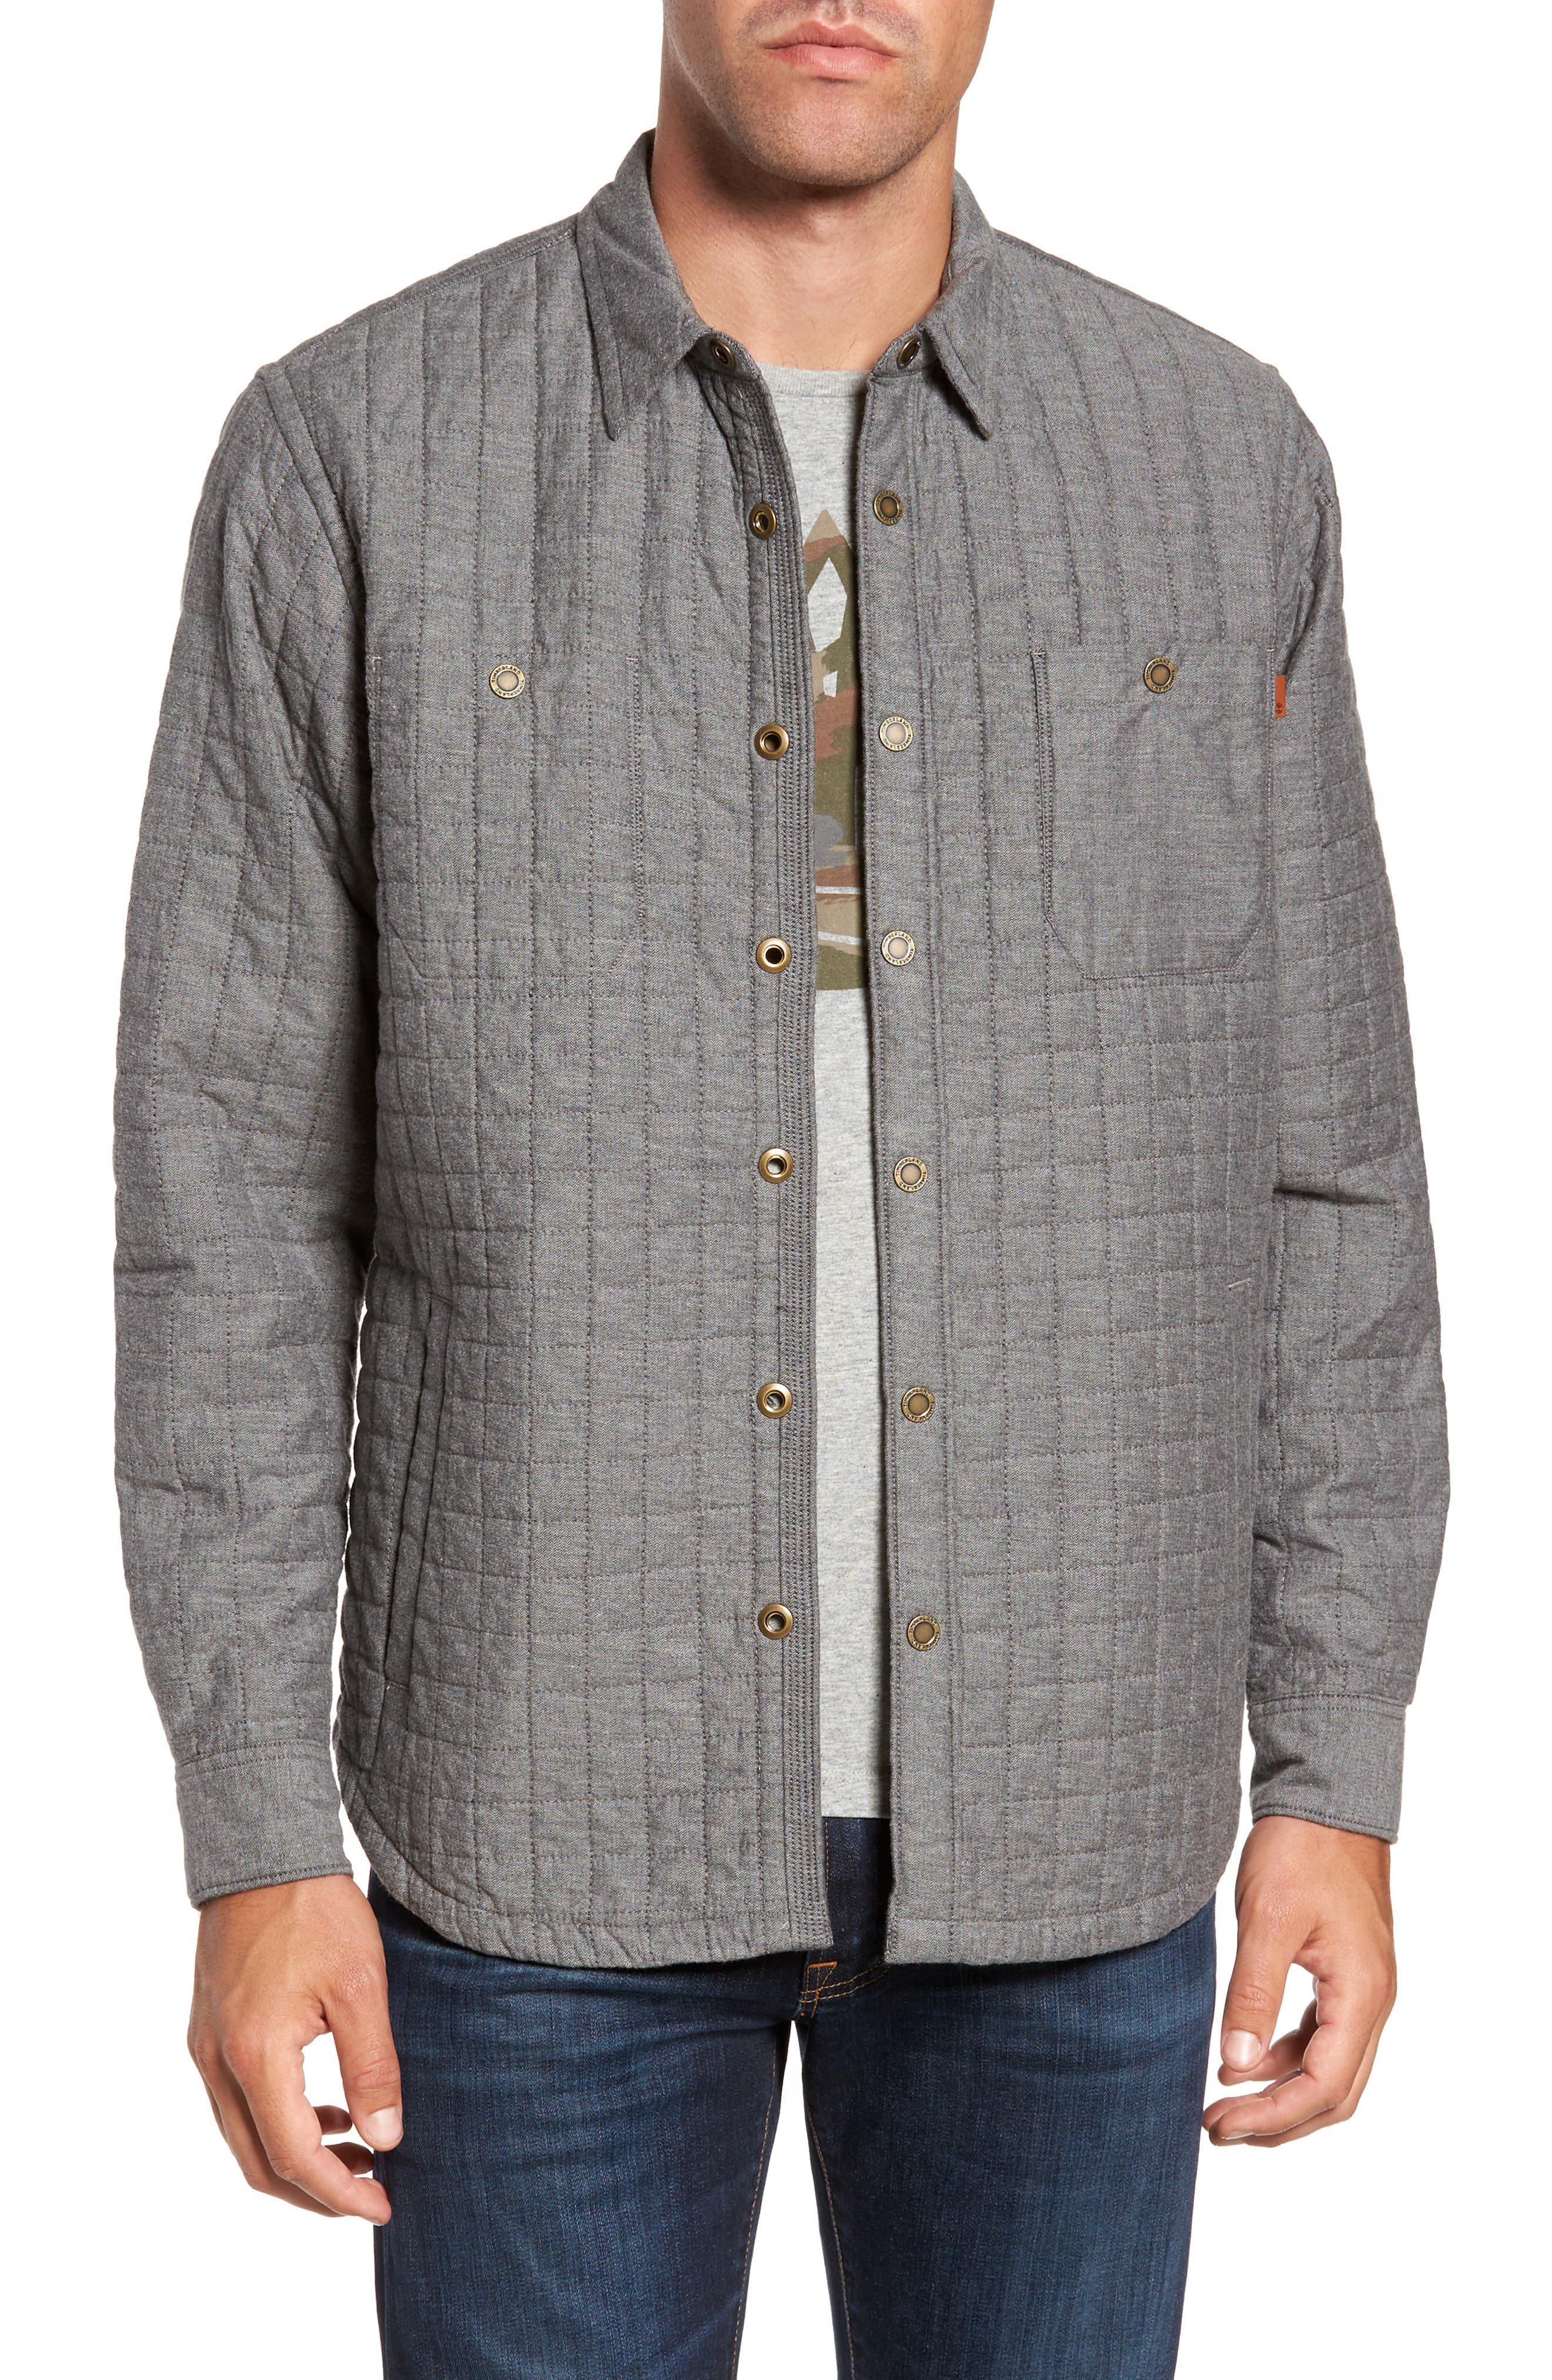 Gunstock River Lightweight Quilted Shirt Jacket,                             Main thumbnail 1, color,                             Grey